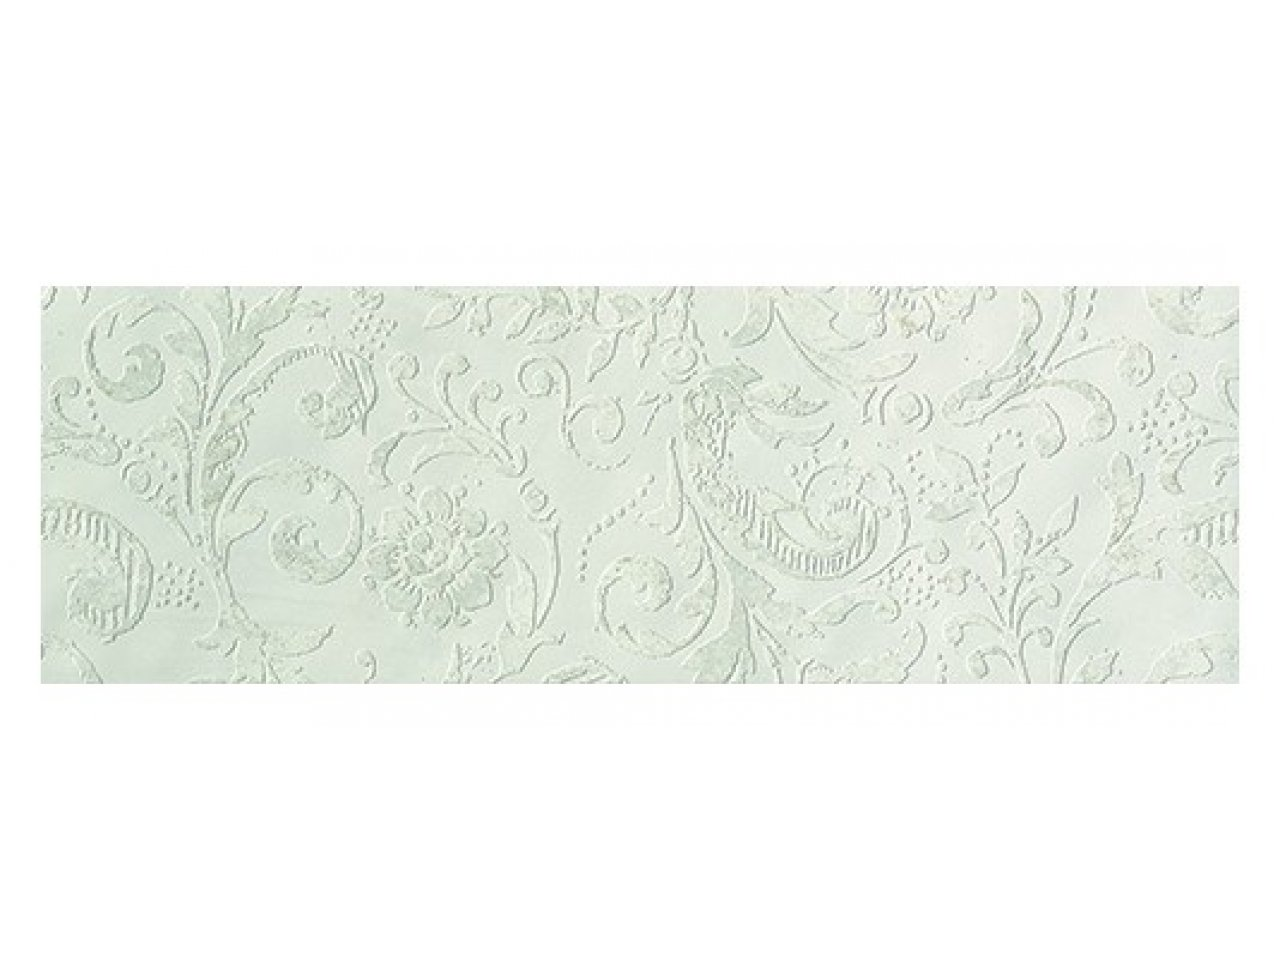 Настенная плитка FAP Color Now Damasco Ghiaccio Inserto 30.5x91.5 см, Арт. fMUR